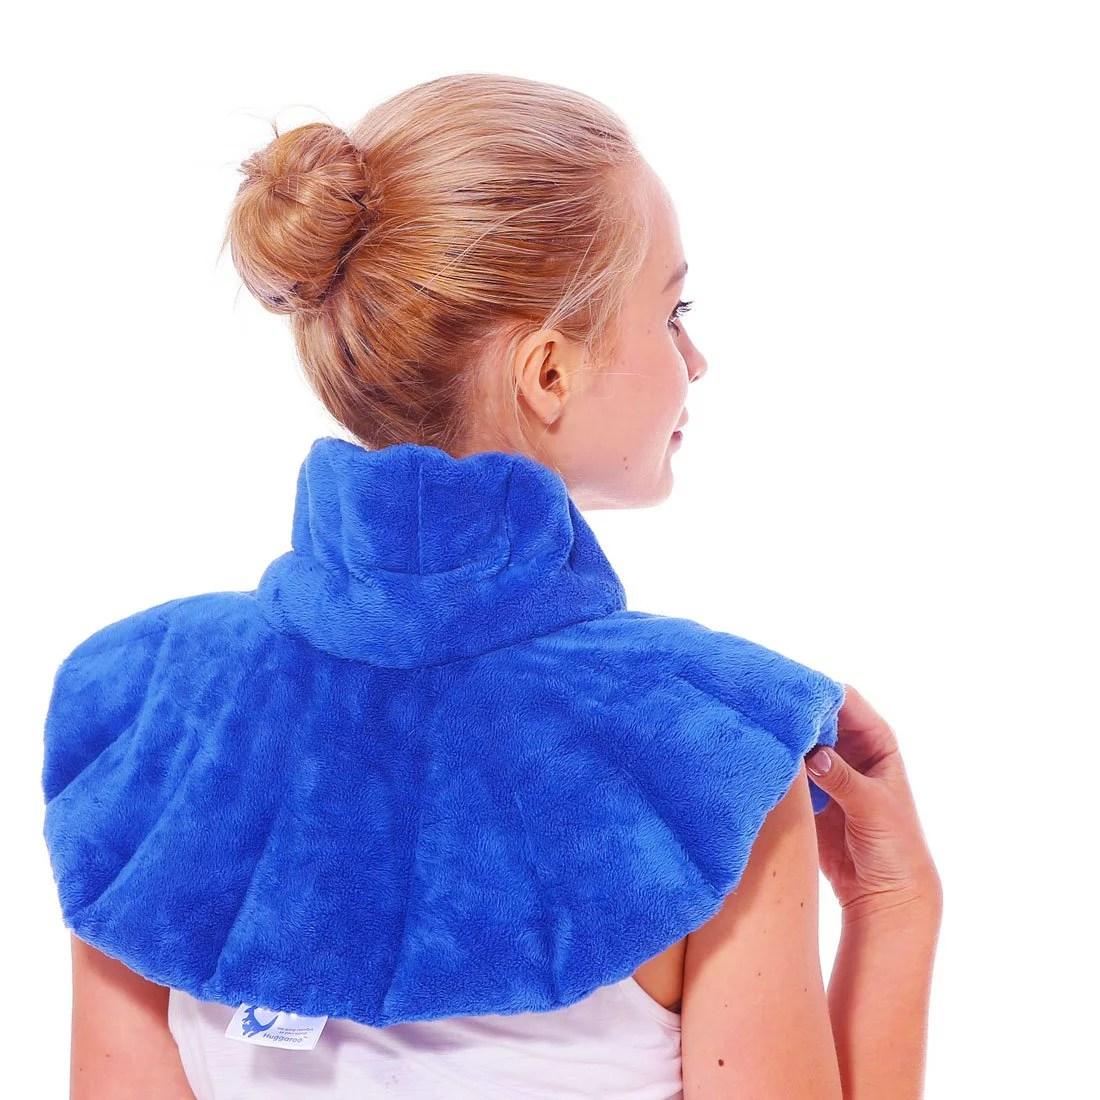 huggaroo neck and shoulder wrap microwavable heating pad with aromatherapy hnws1b walmart com